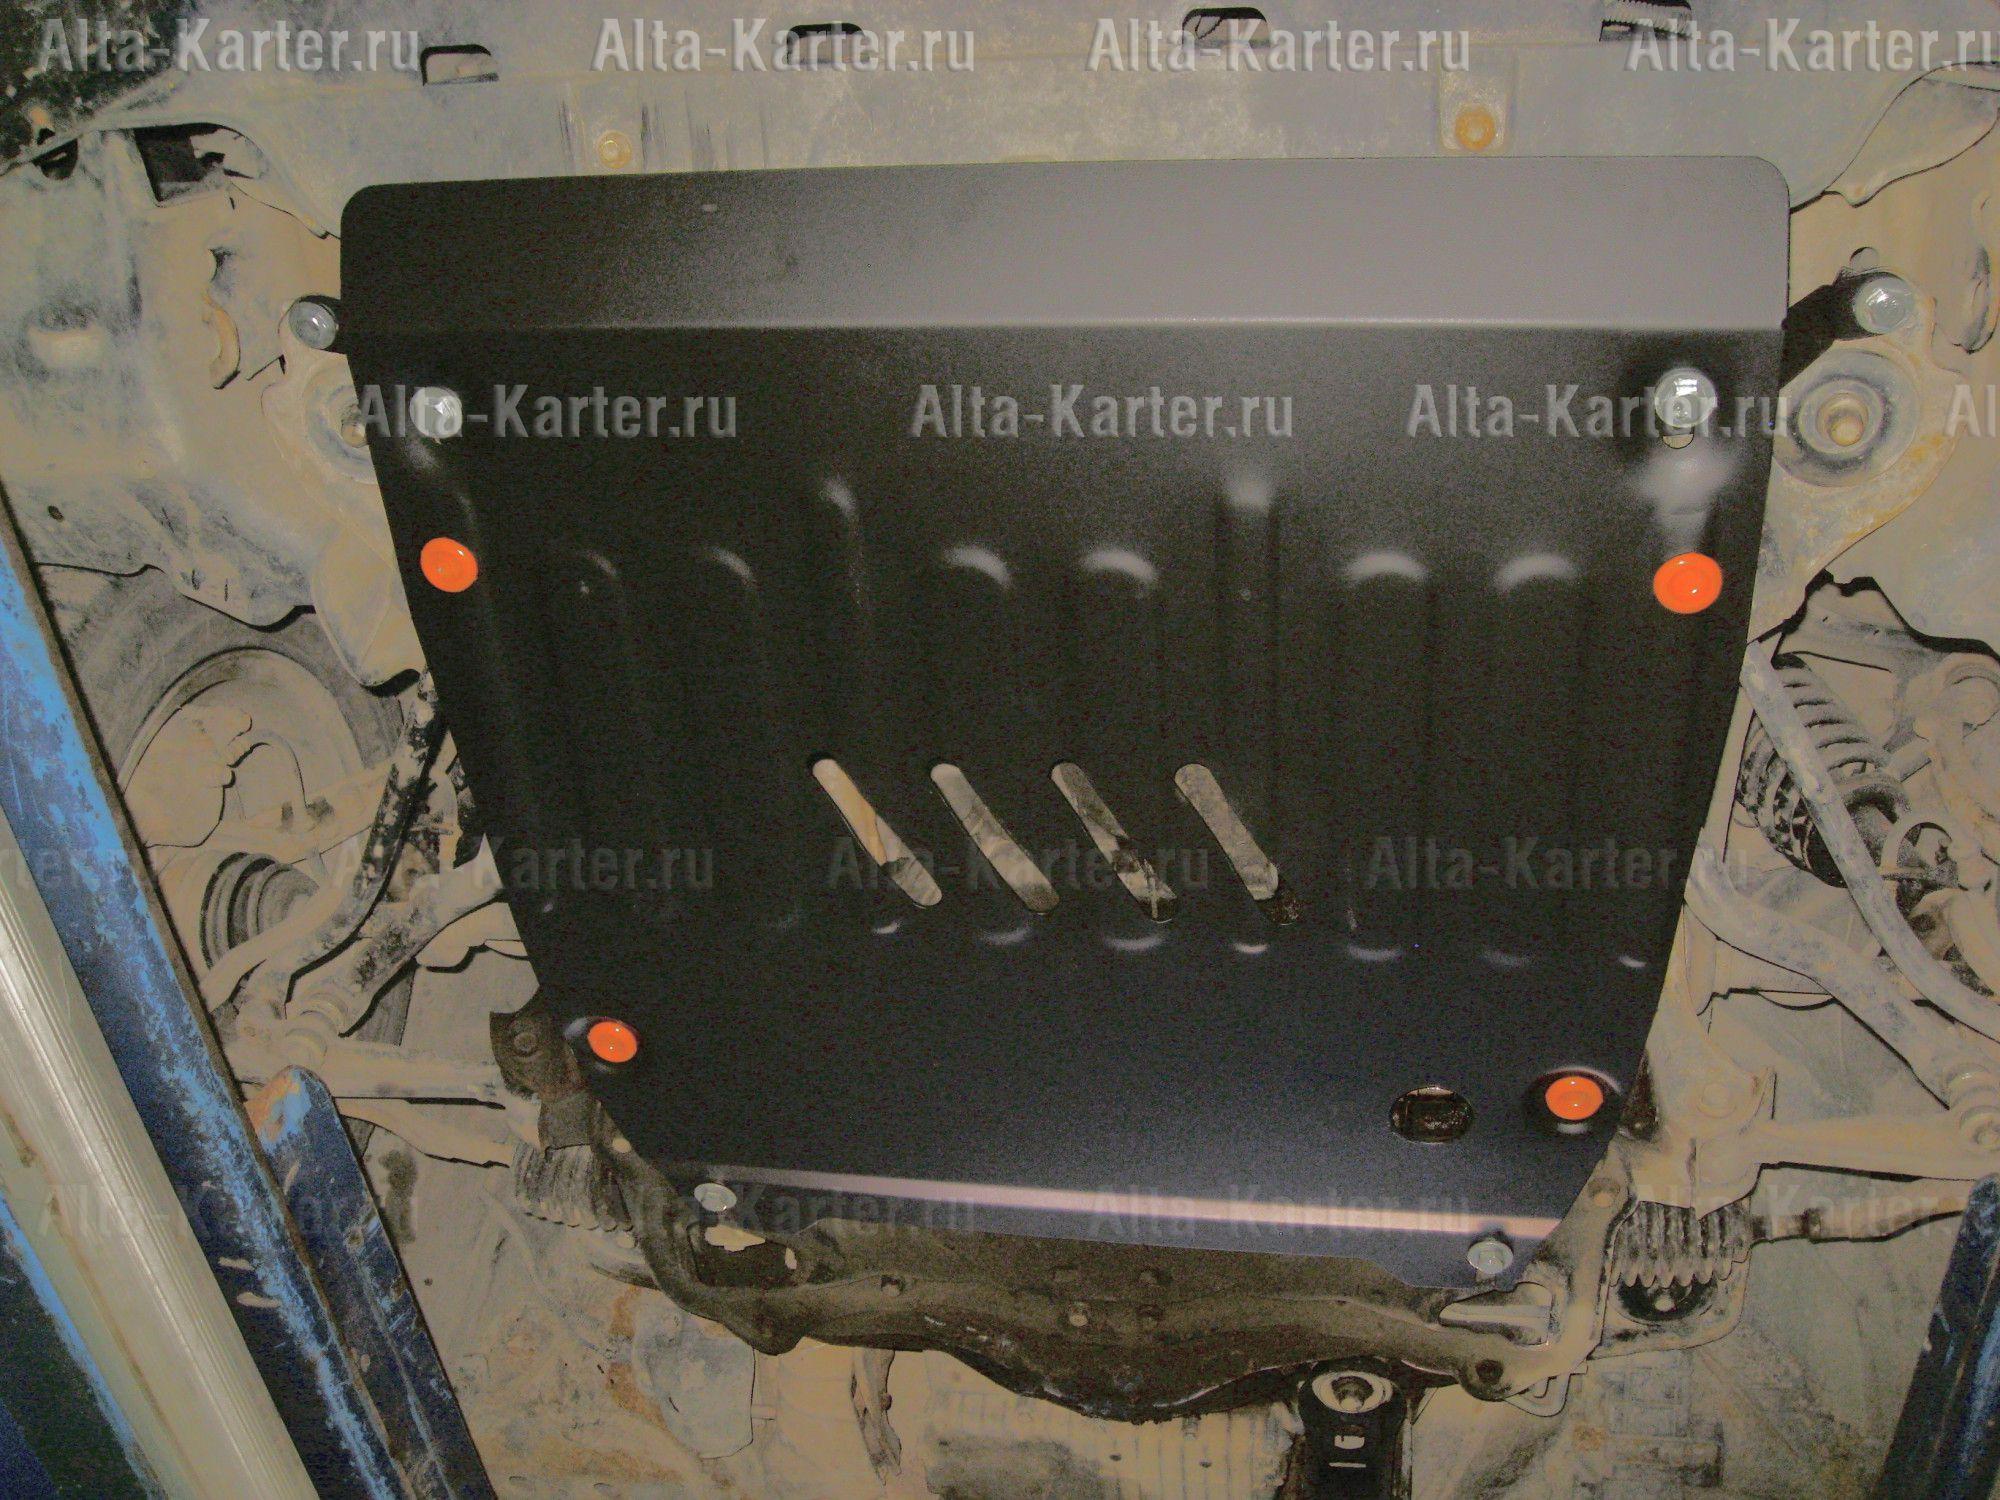 Защита Alfeco для картера Honda Inspire 1995-1998. Артикул ALF.09.36